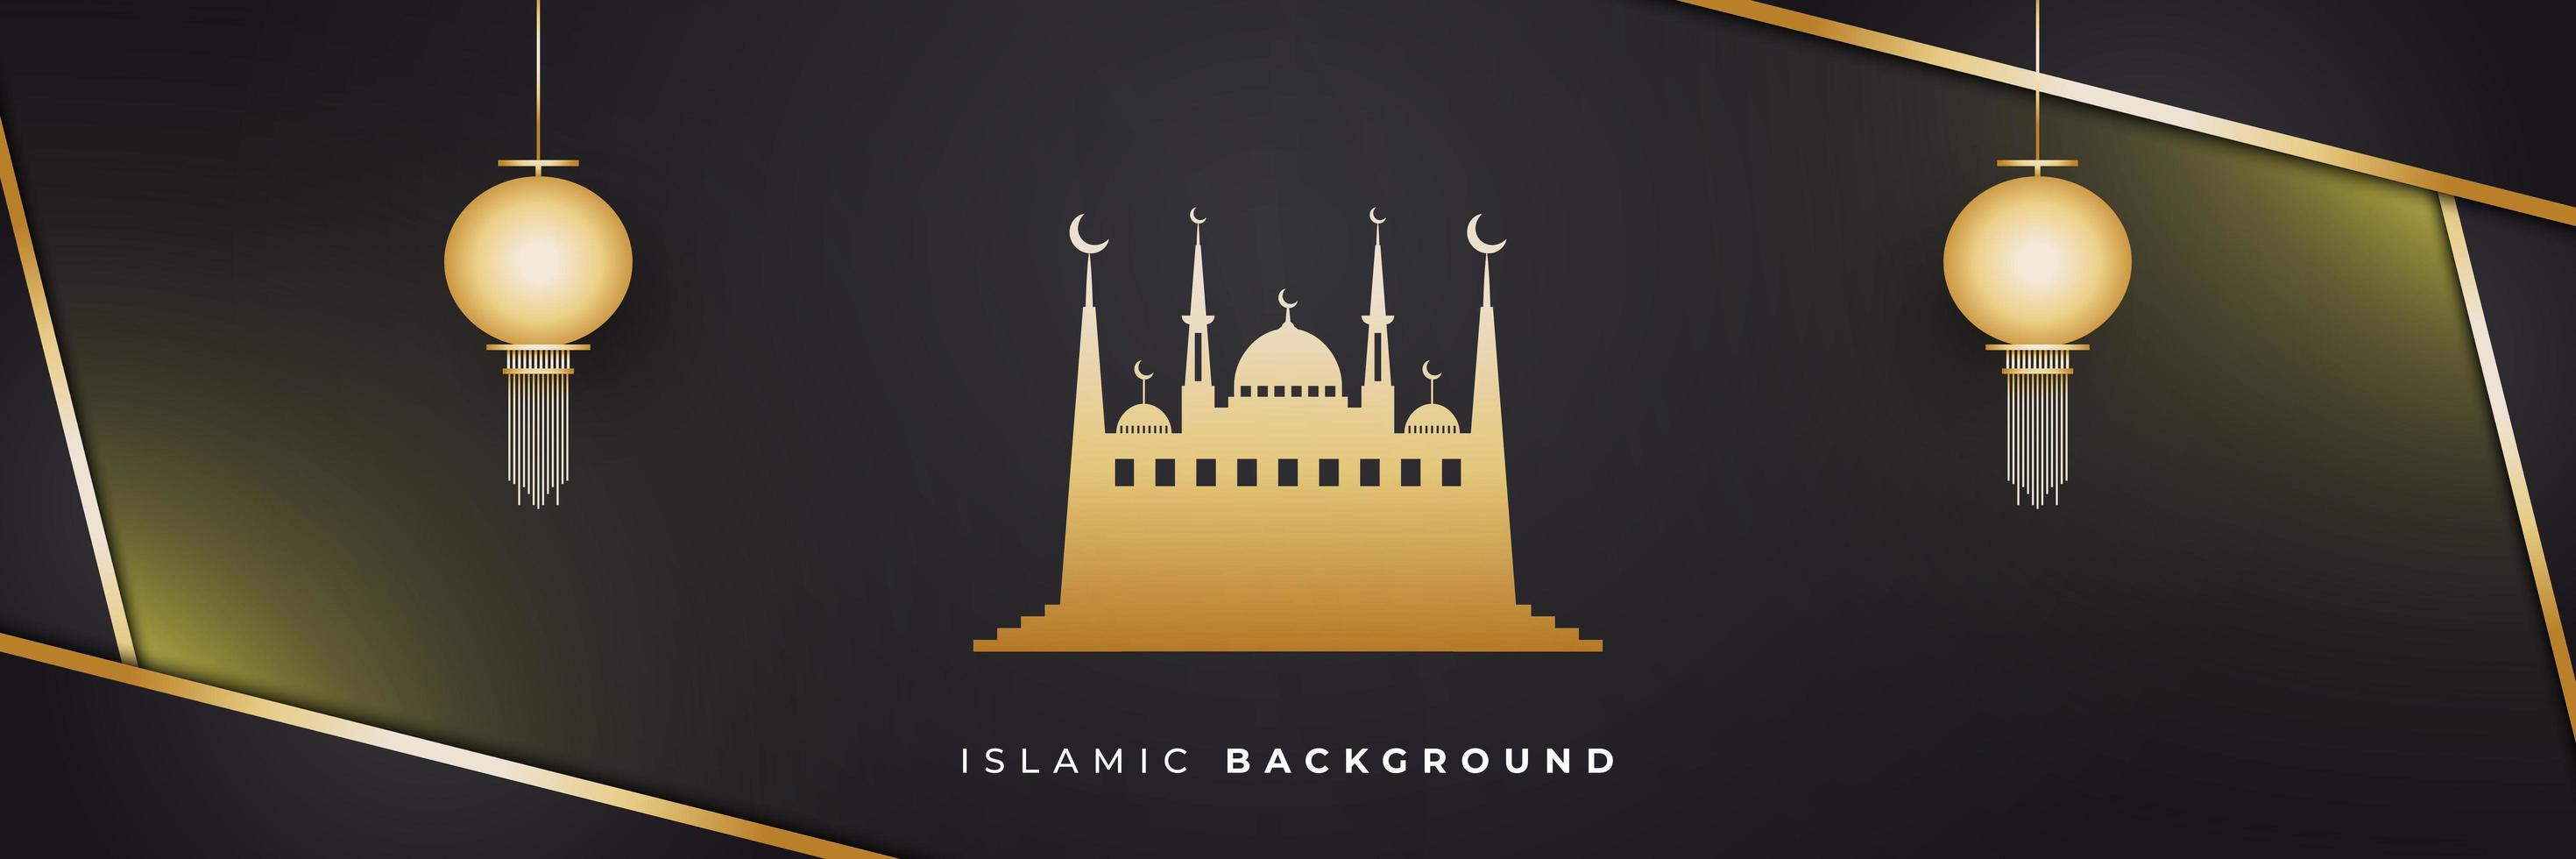 Ramadán Kareem y hermosa mezquita vector